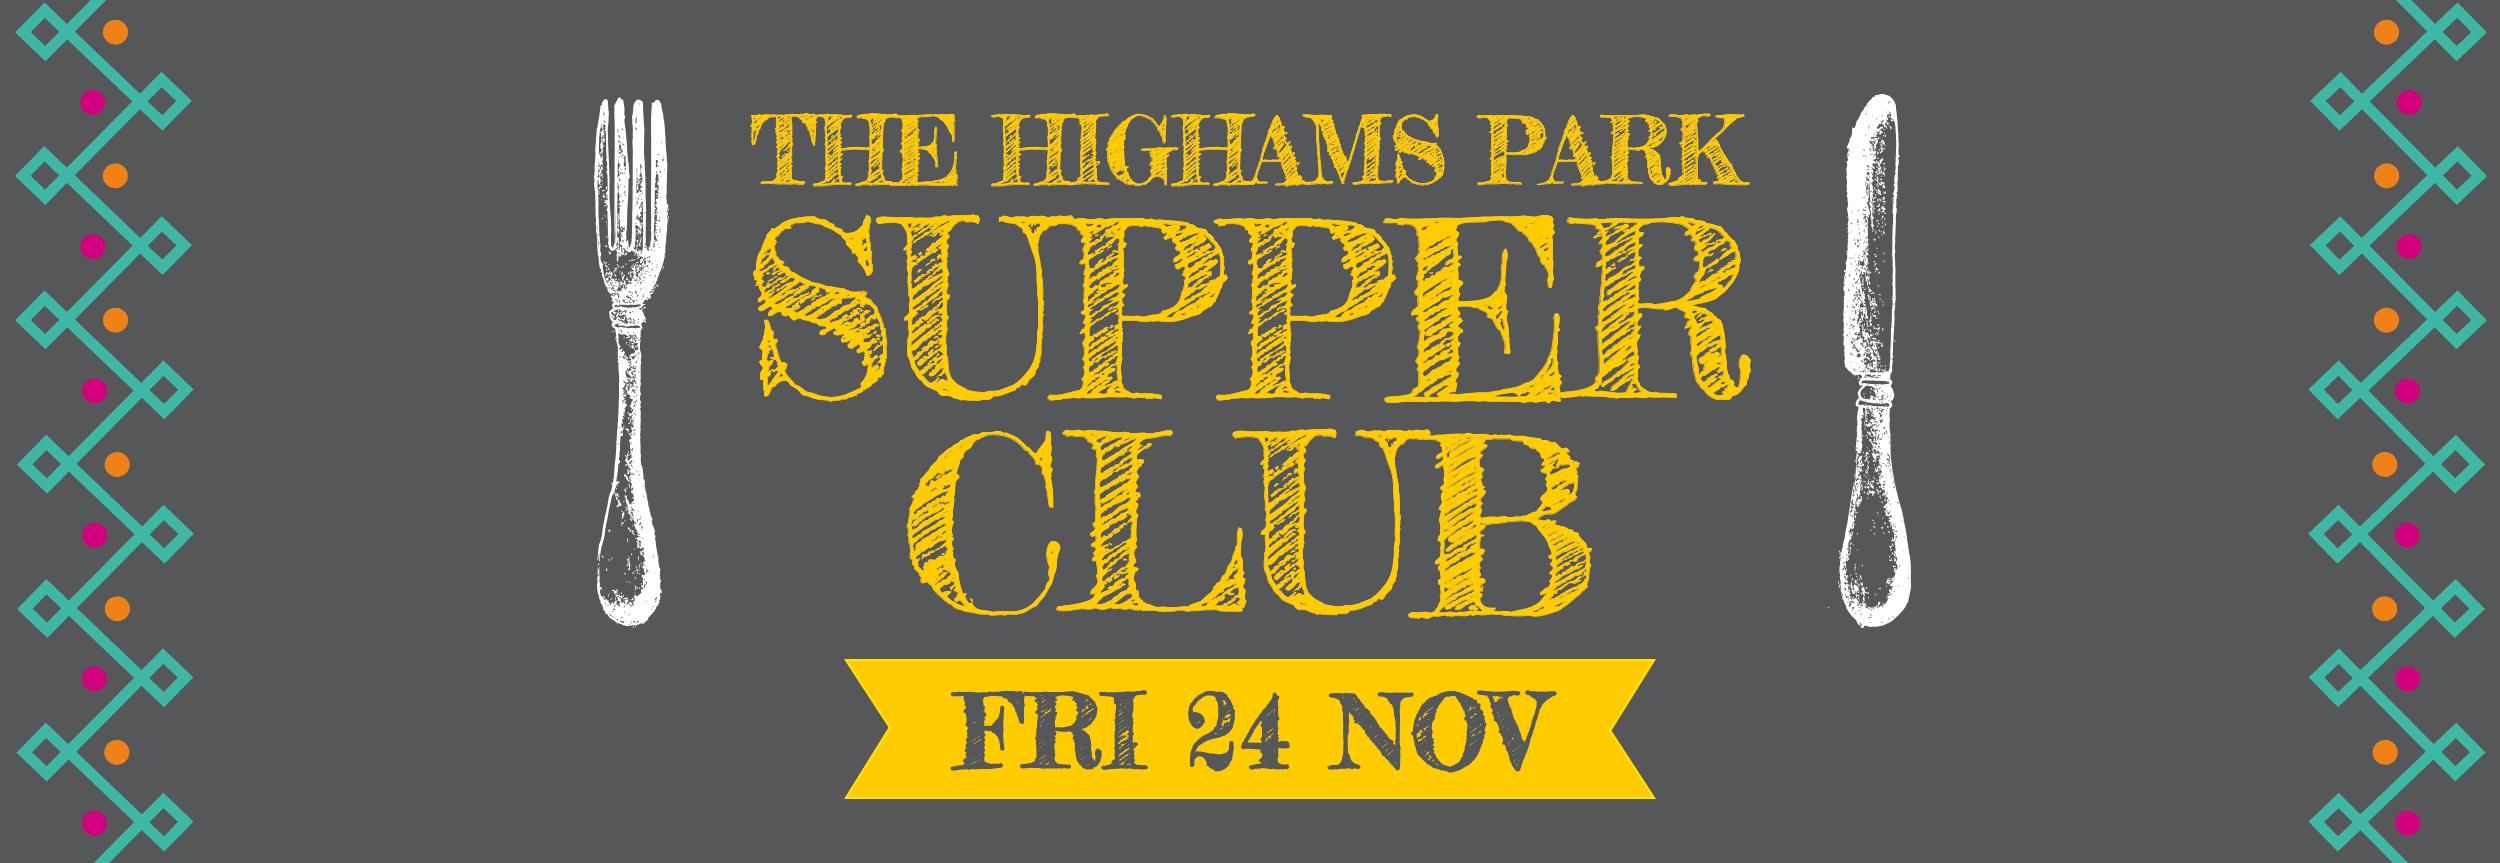 The Highams Park Supper Club